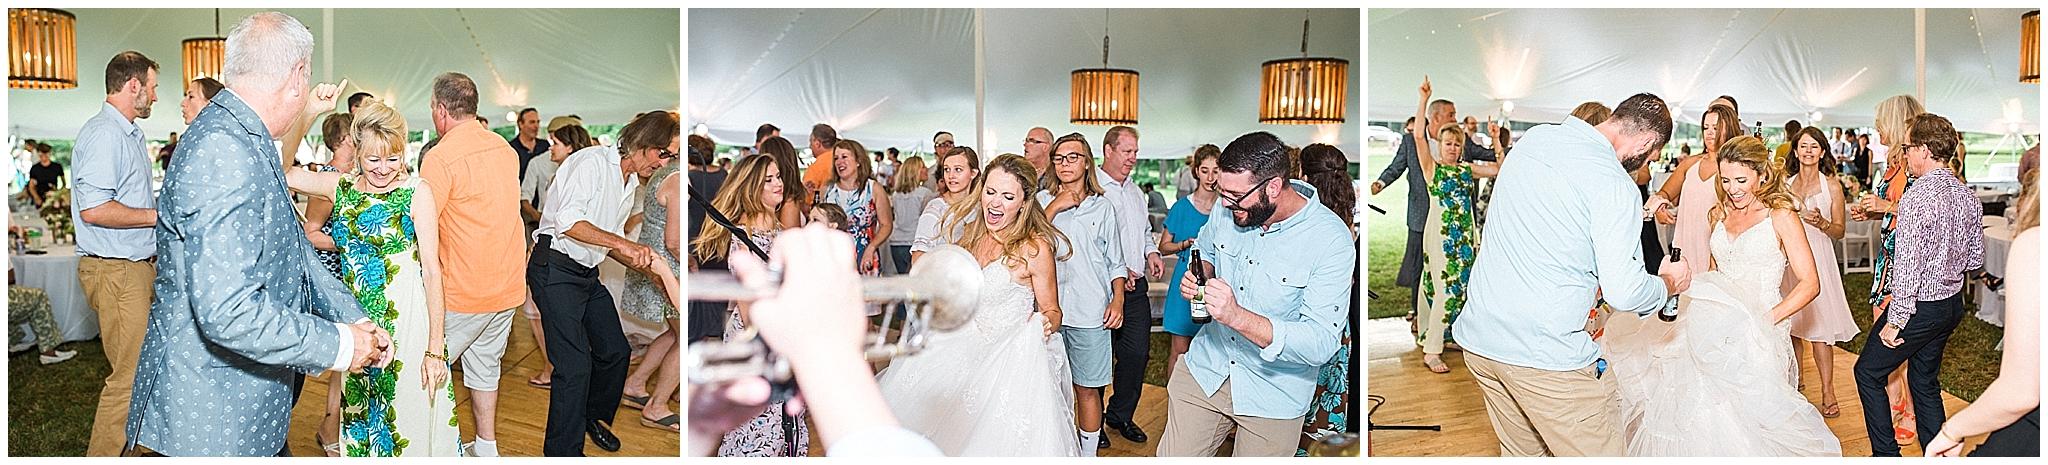 Wedding_Asheville_Photography_Junebug_Retro_Resort_13.jpg